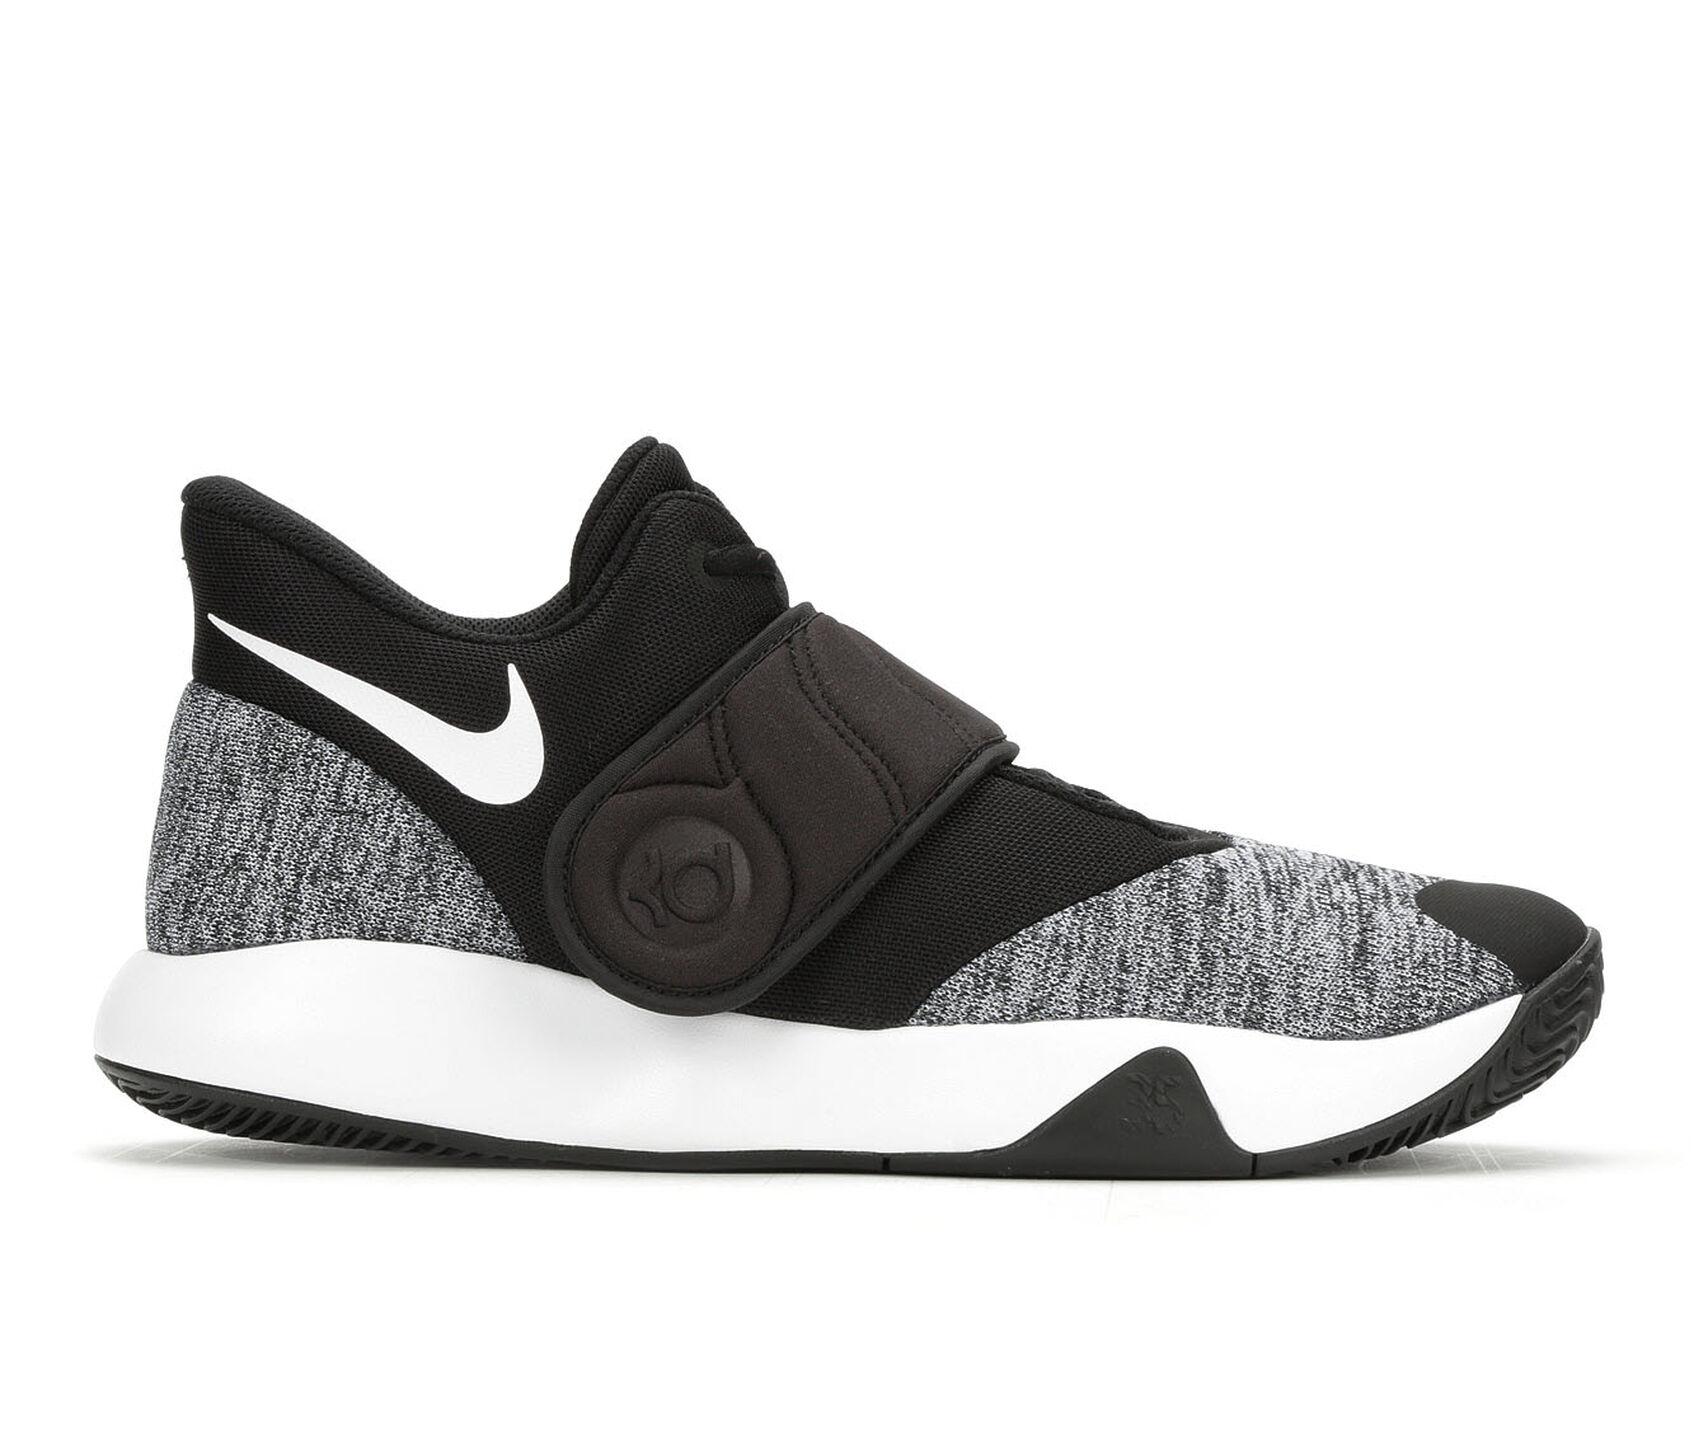 cc6aa9abef91 ... Nike KD Trey 5 VI High Top Basketball Shoes. Previous